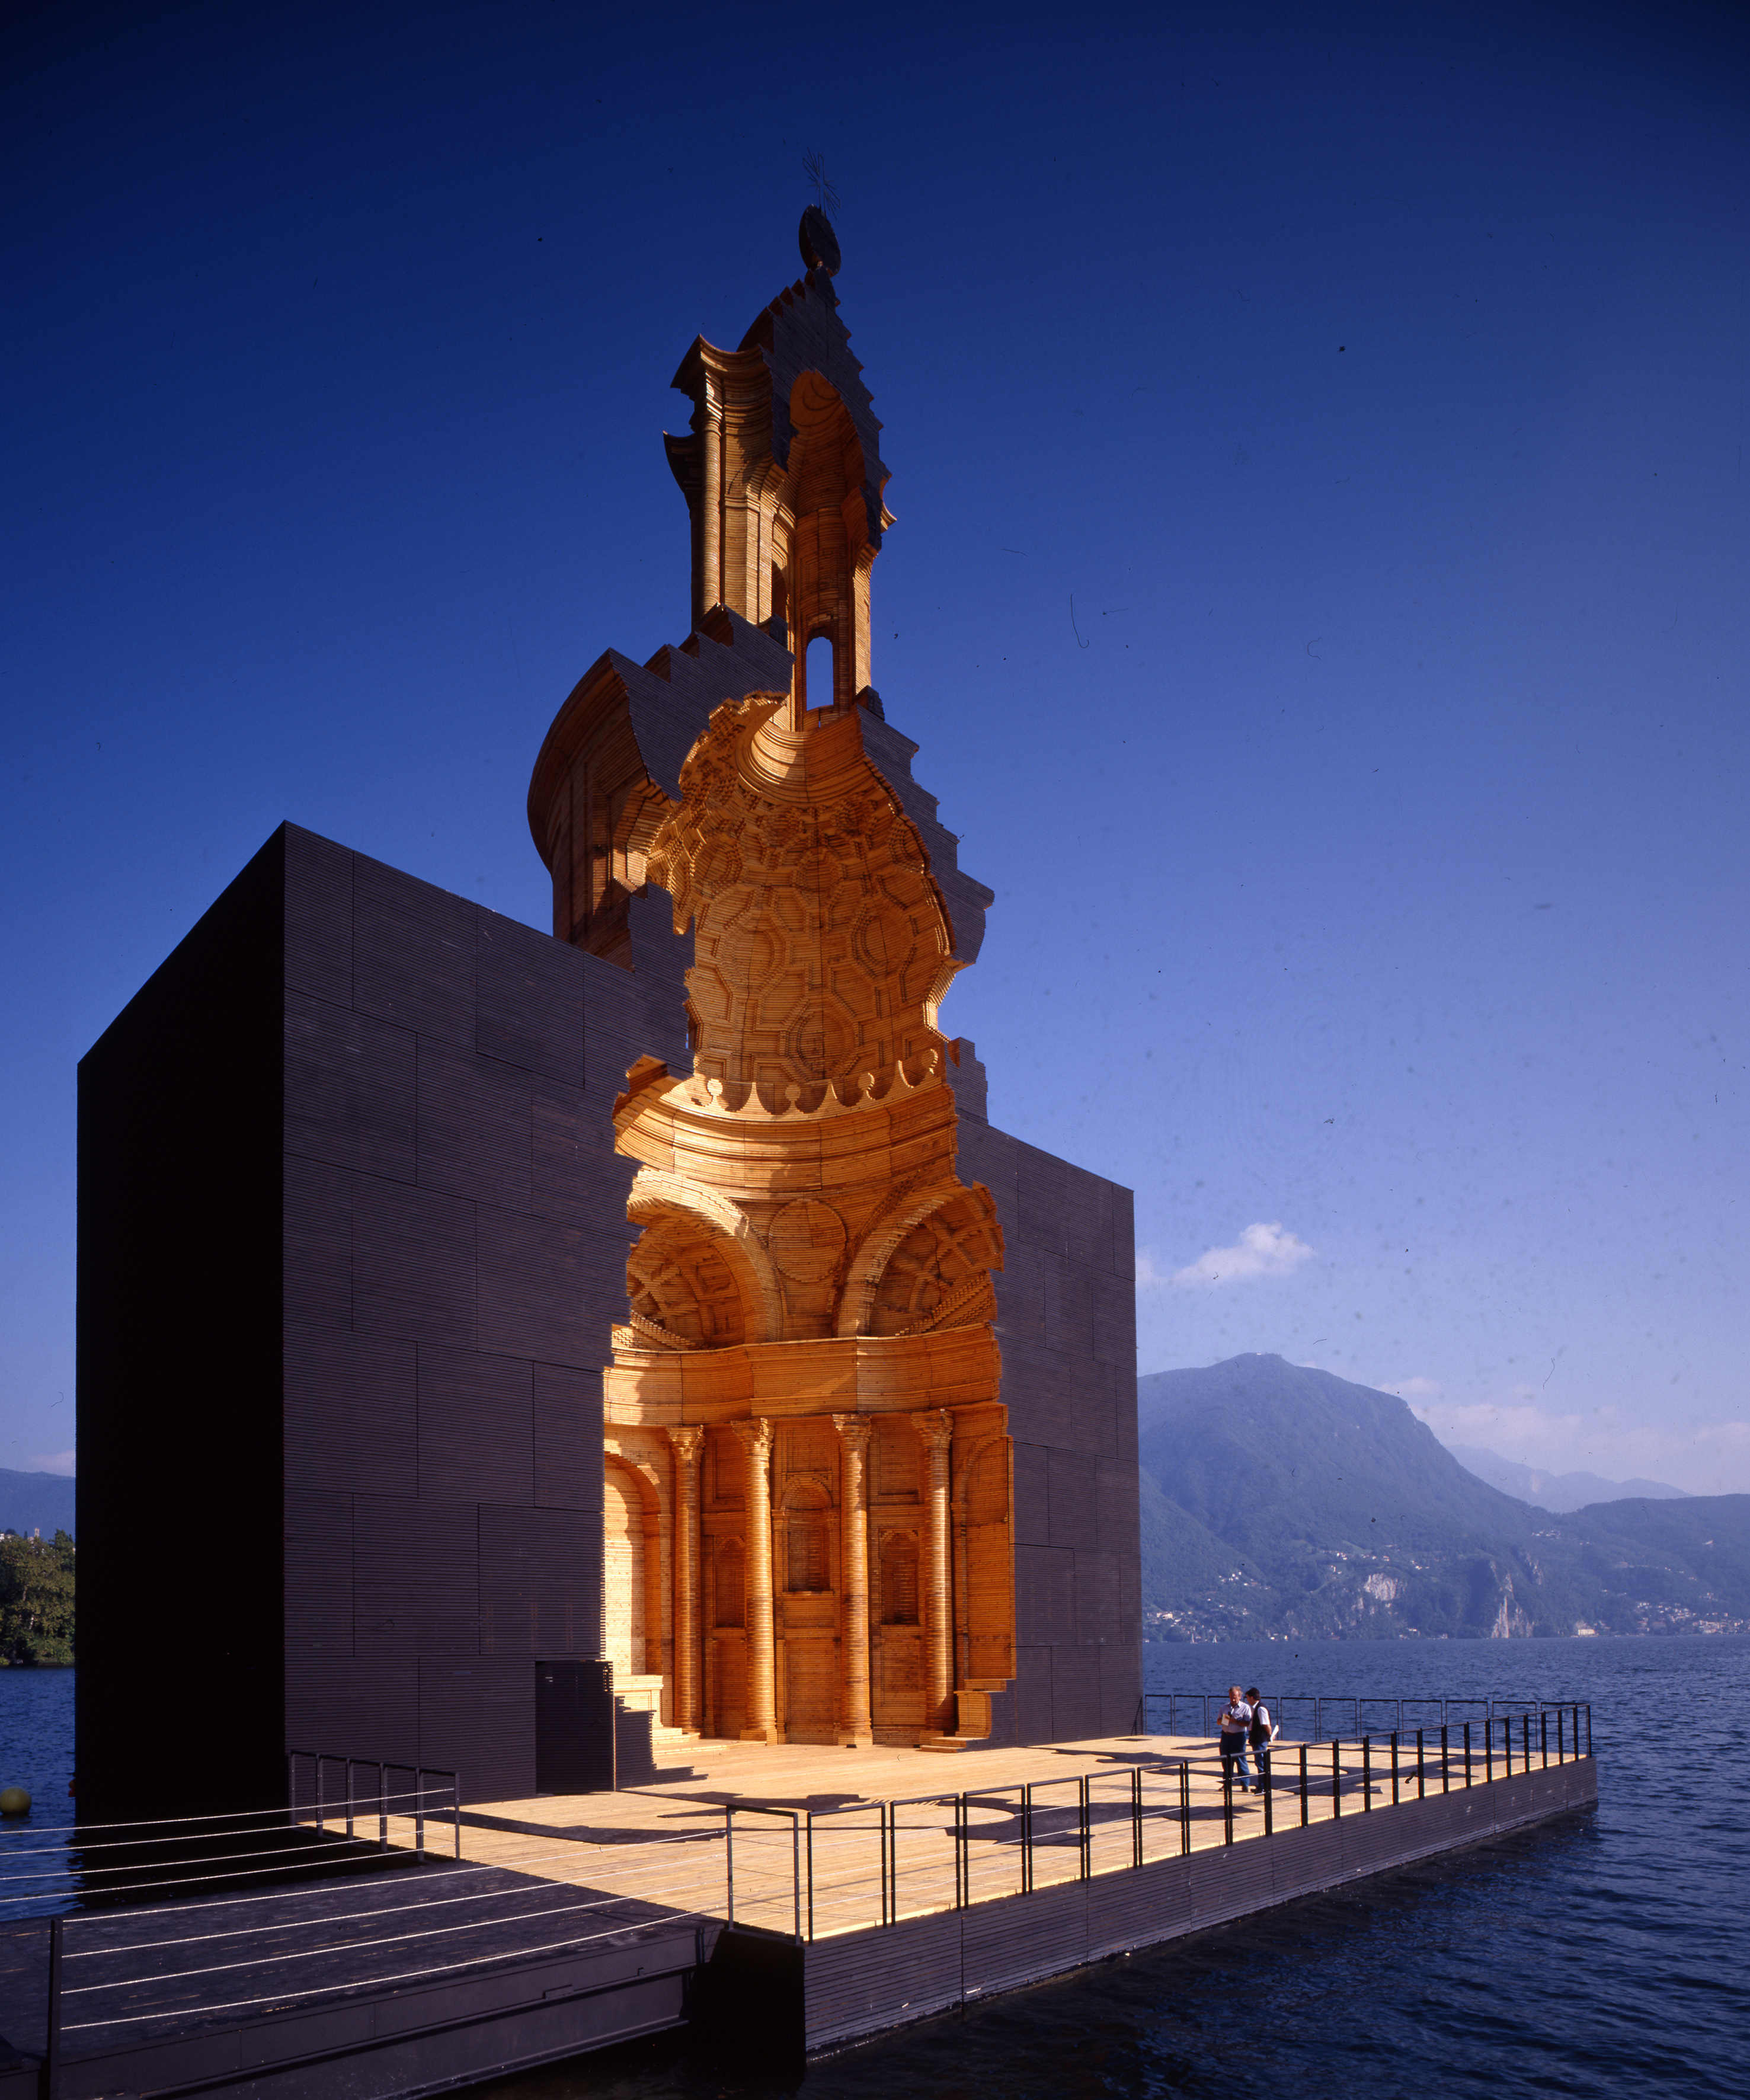 San Carlino, Lugano (CH)